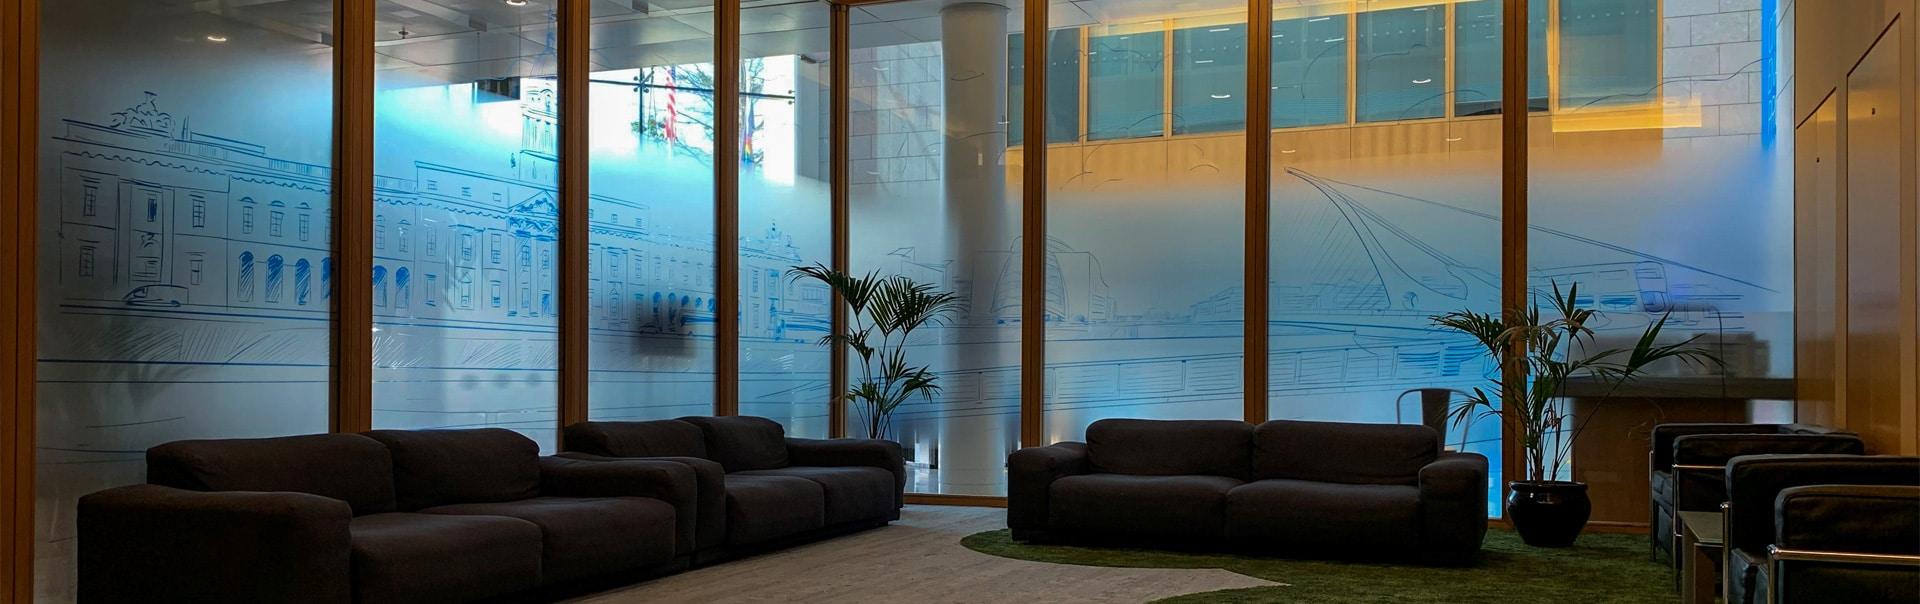 Printed manifestations screen office windows in imaginative ways